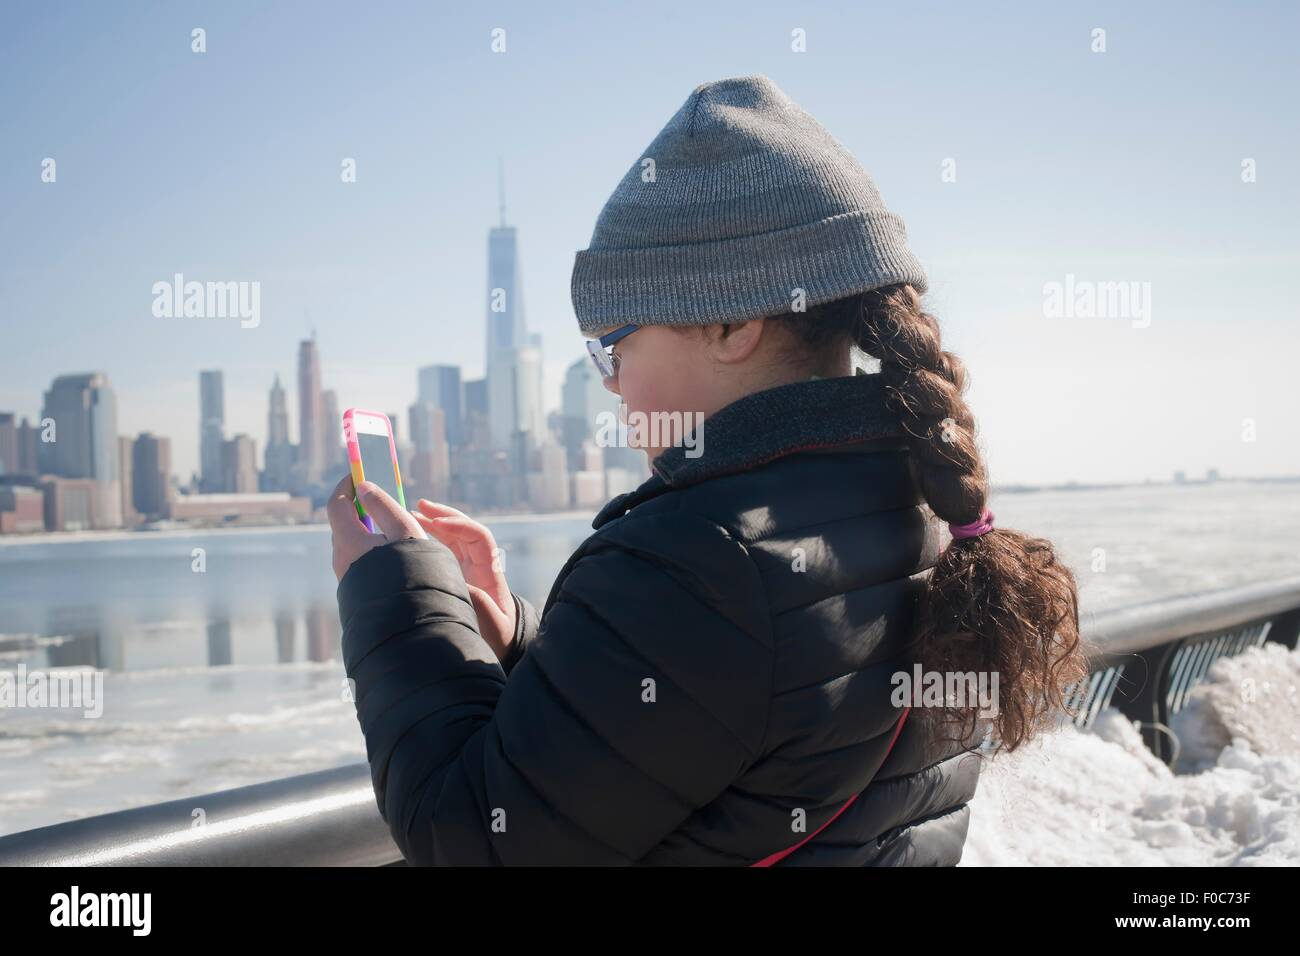 Young girl taking photograph of skyline using smartphone, New York, NY, USA - Stock Image